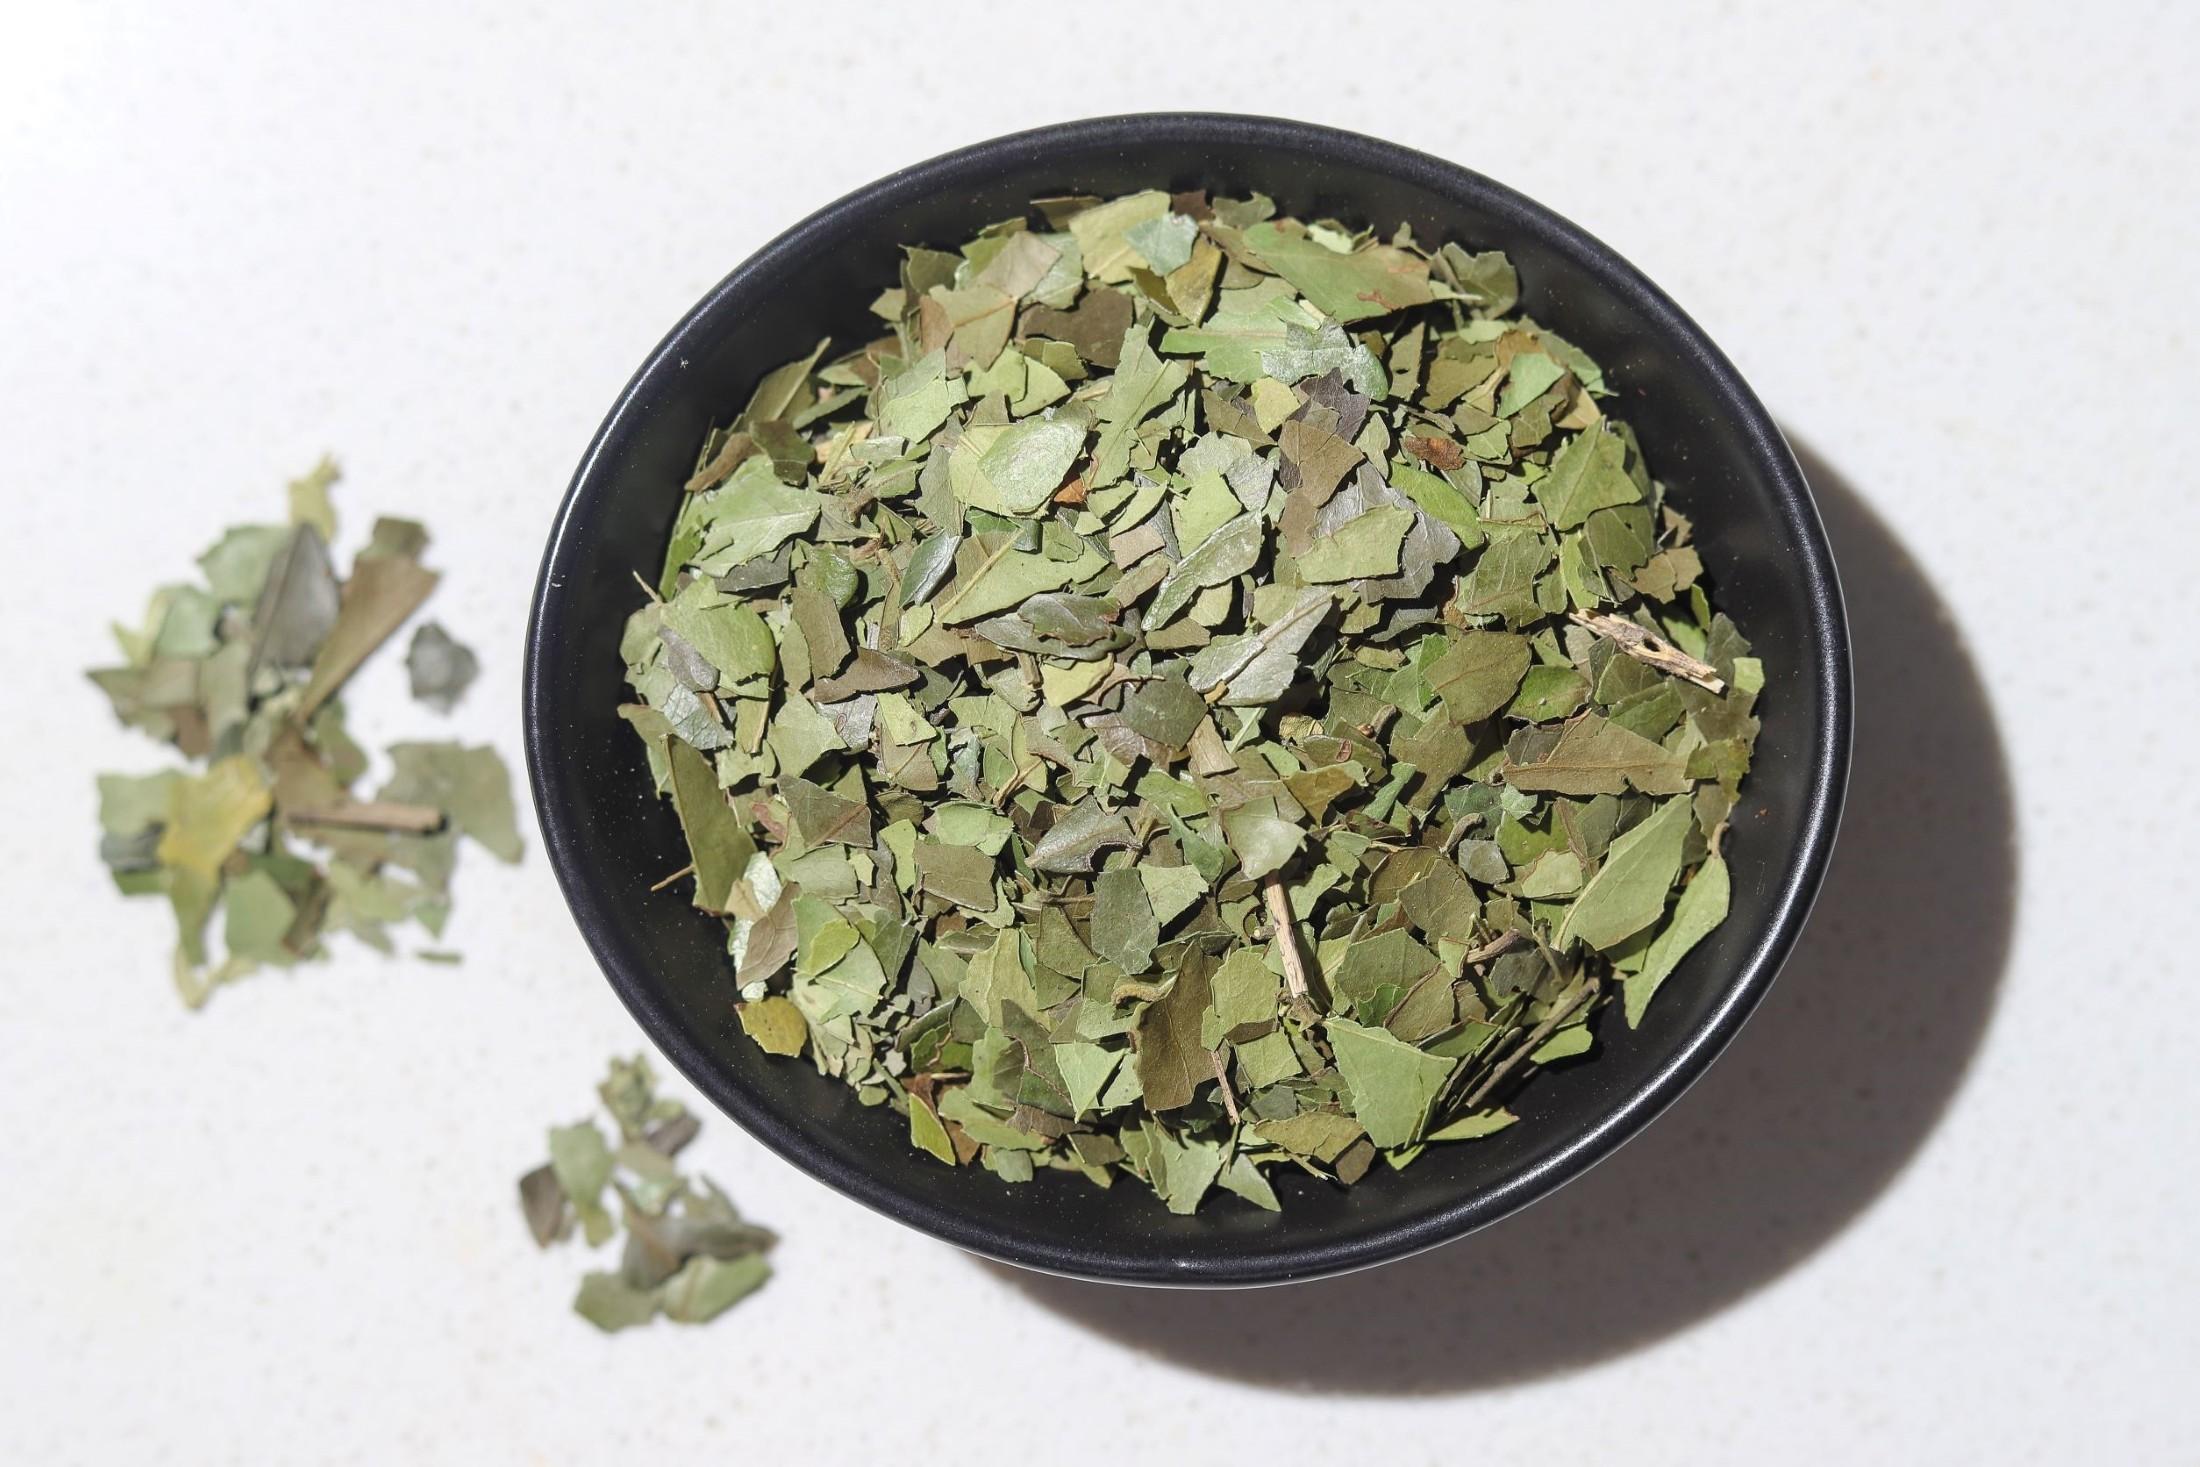 Buy Yaupon Tea Canada, Yaupon Tea USA, Ilex Vomitoria leaves